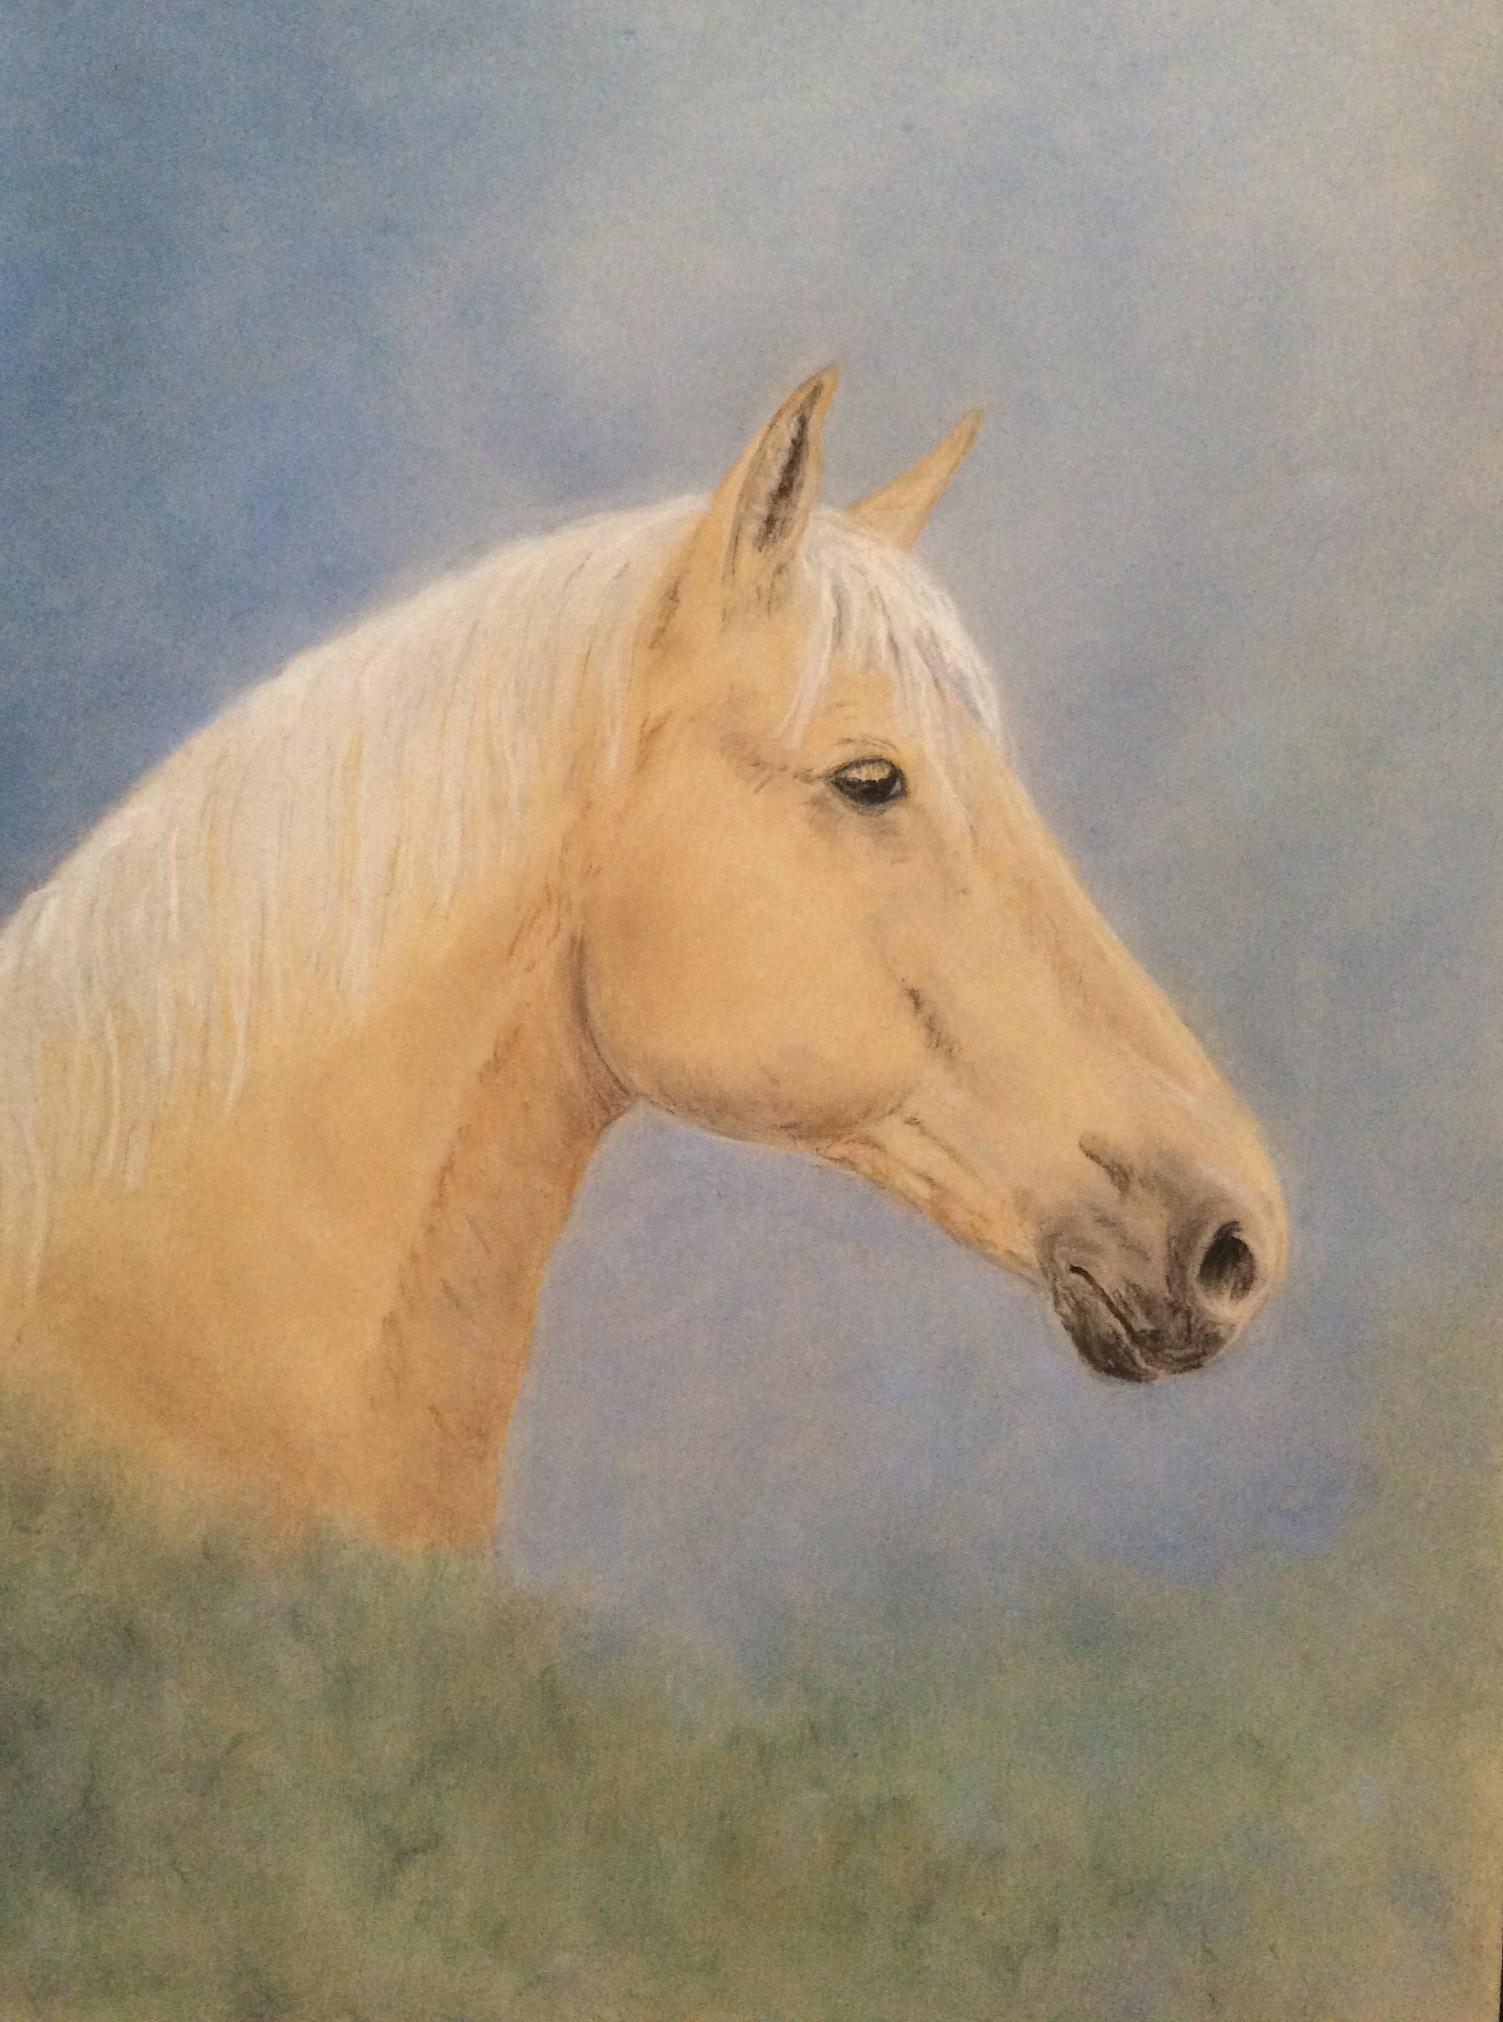 RA blonde horse